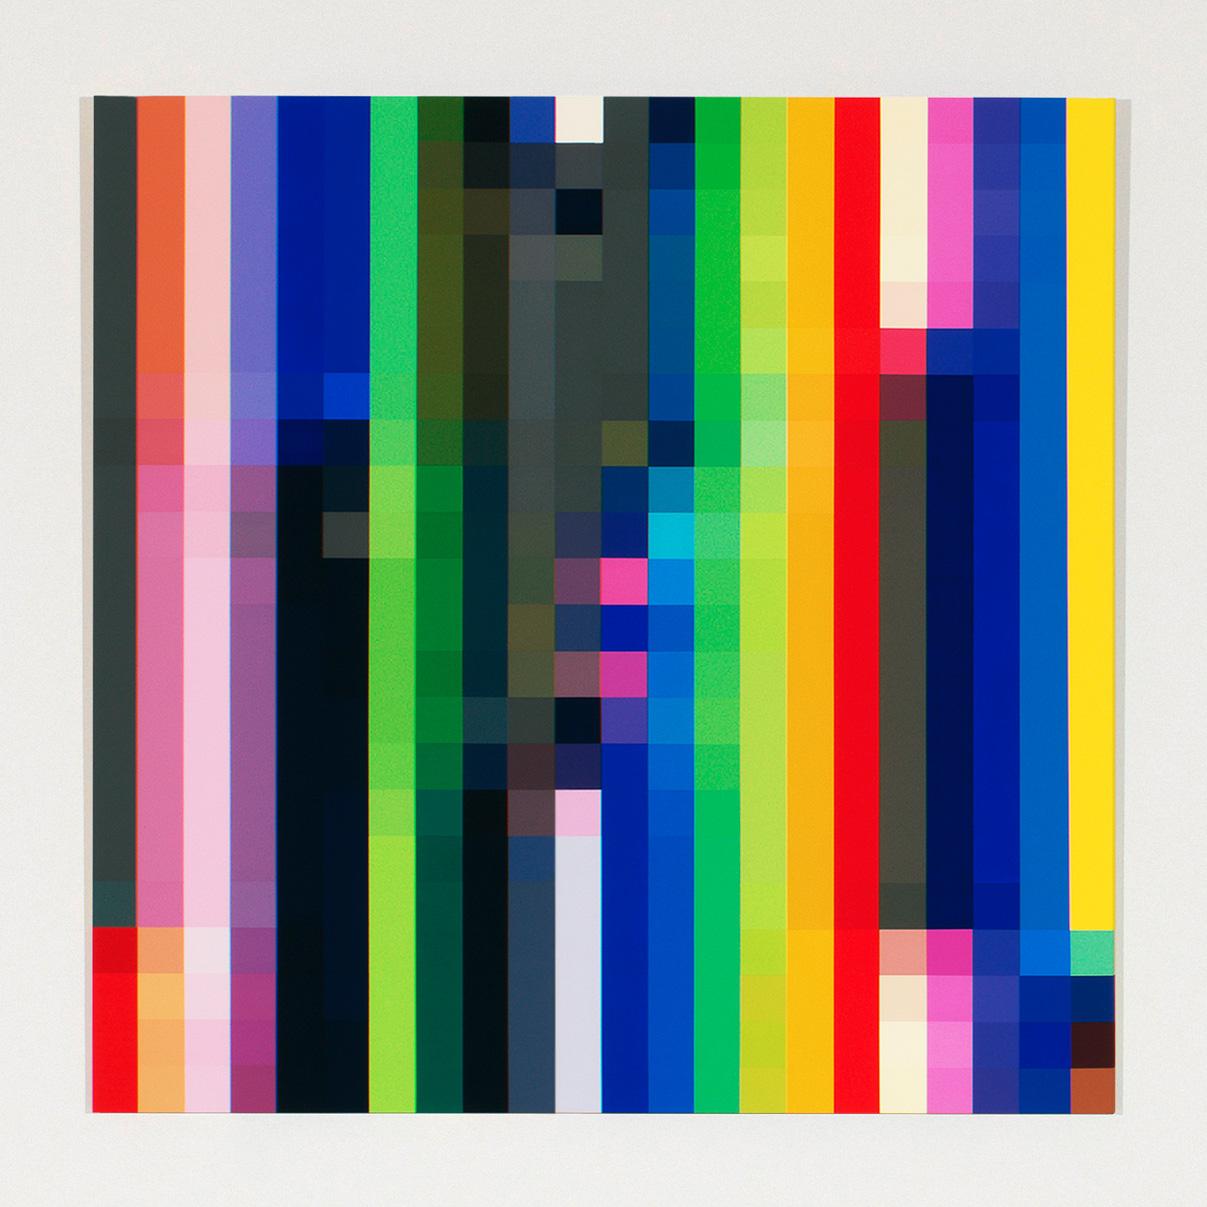 Spectrum Shift #1